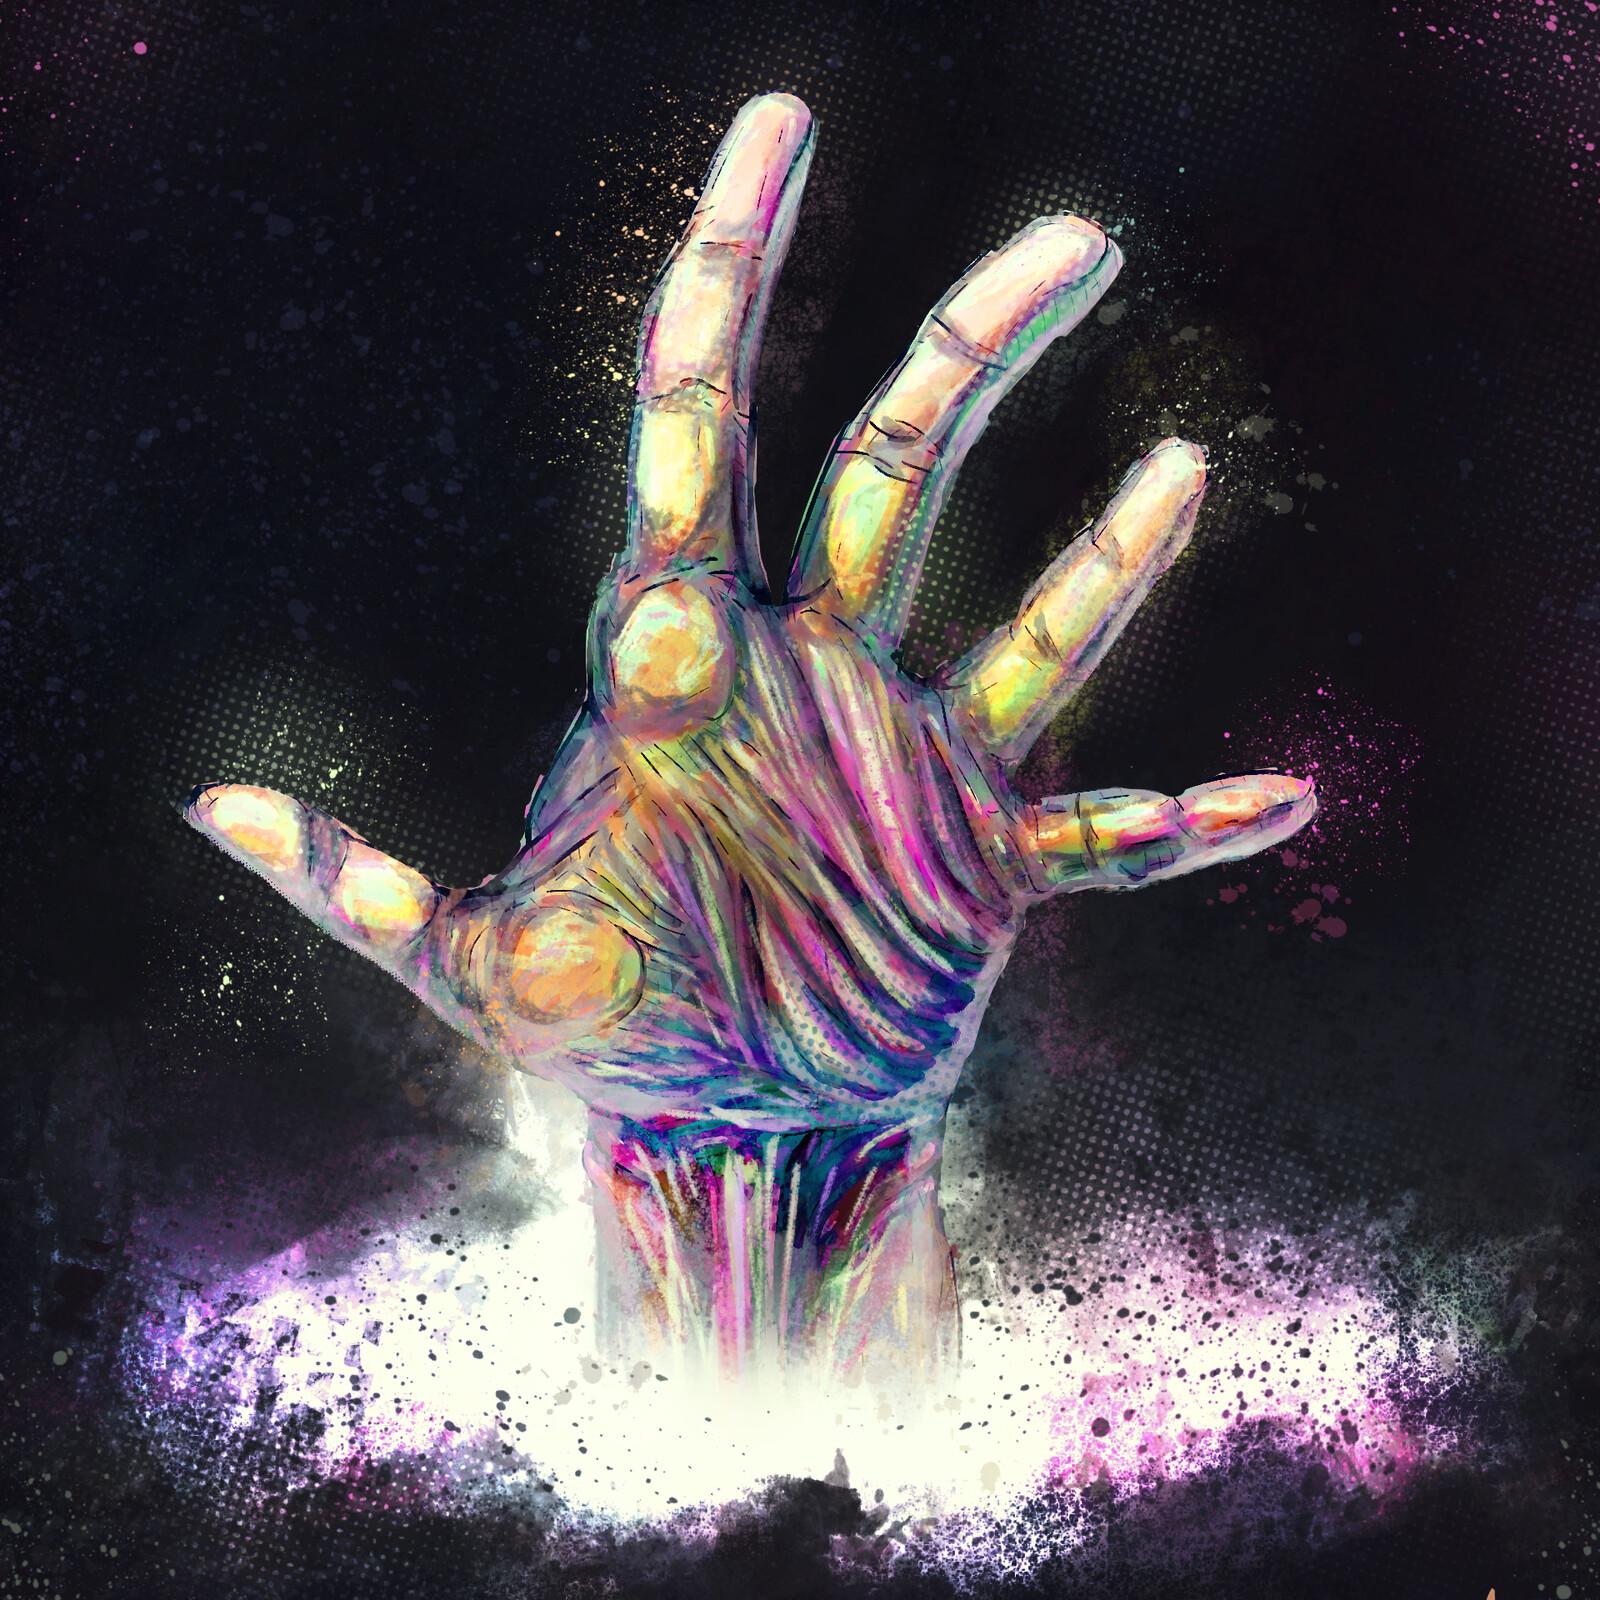 Elemental Hand Nr. 3 - Neon